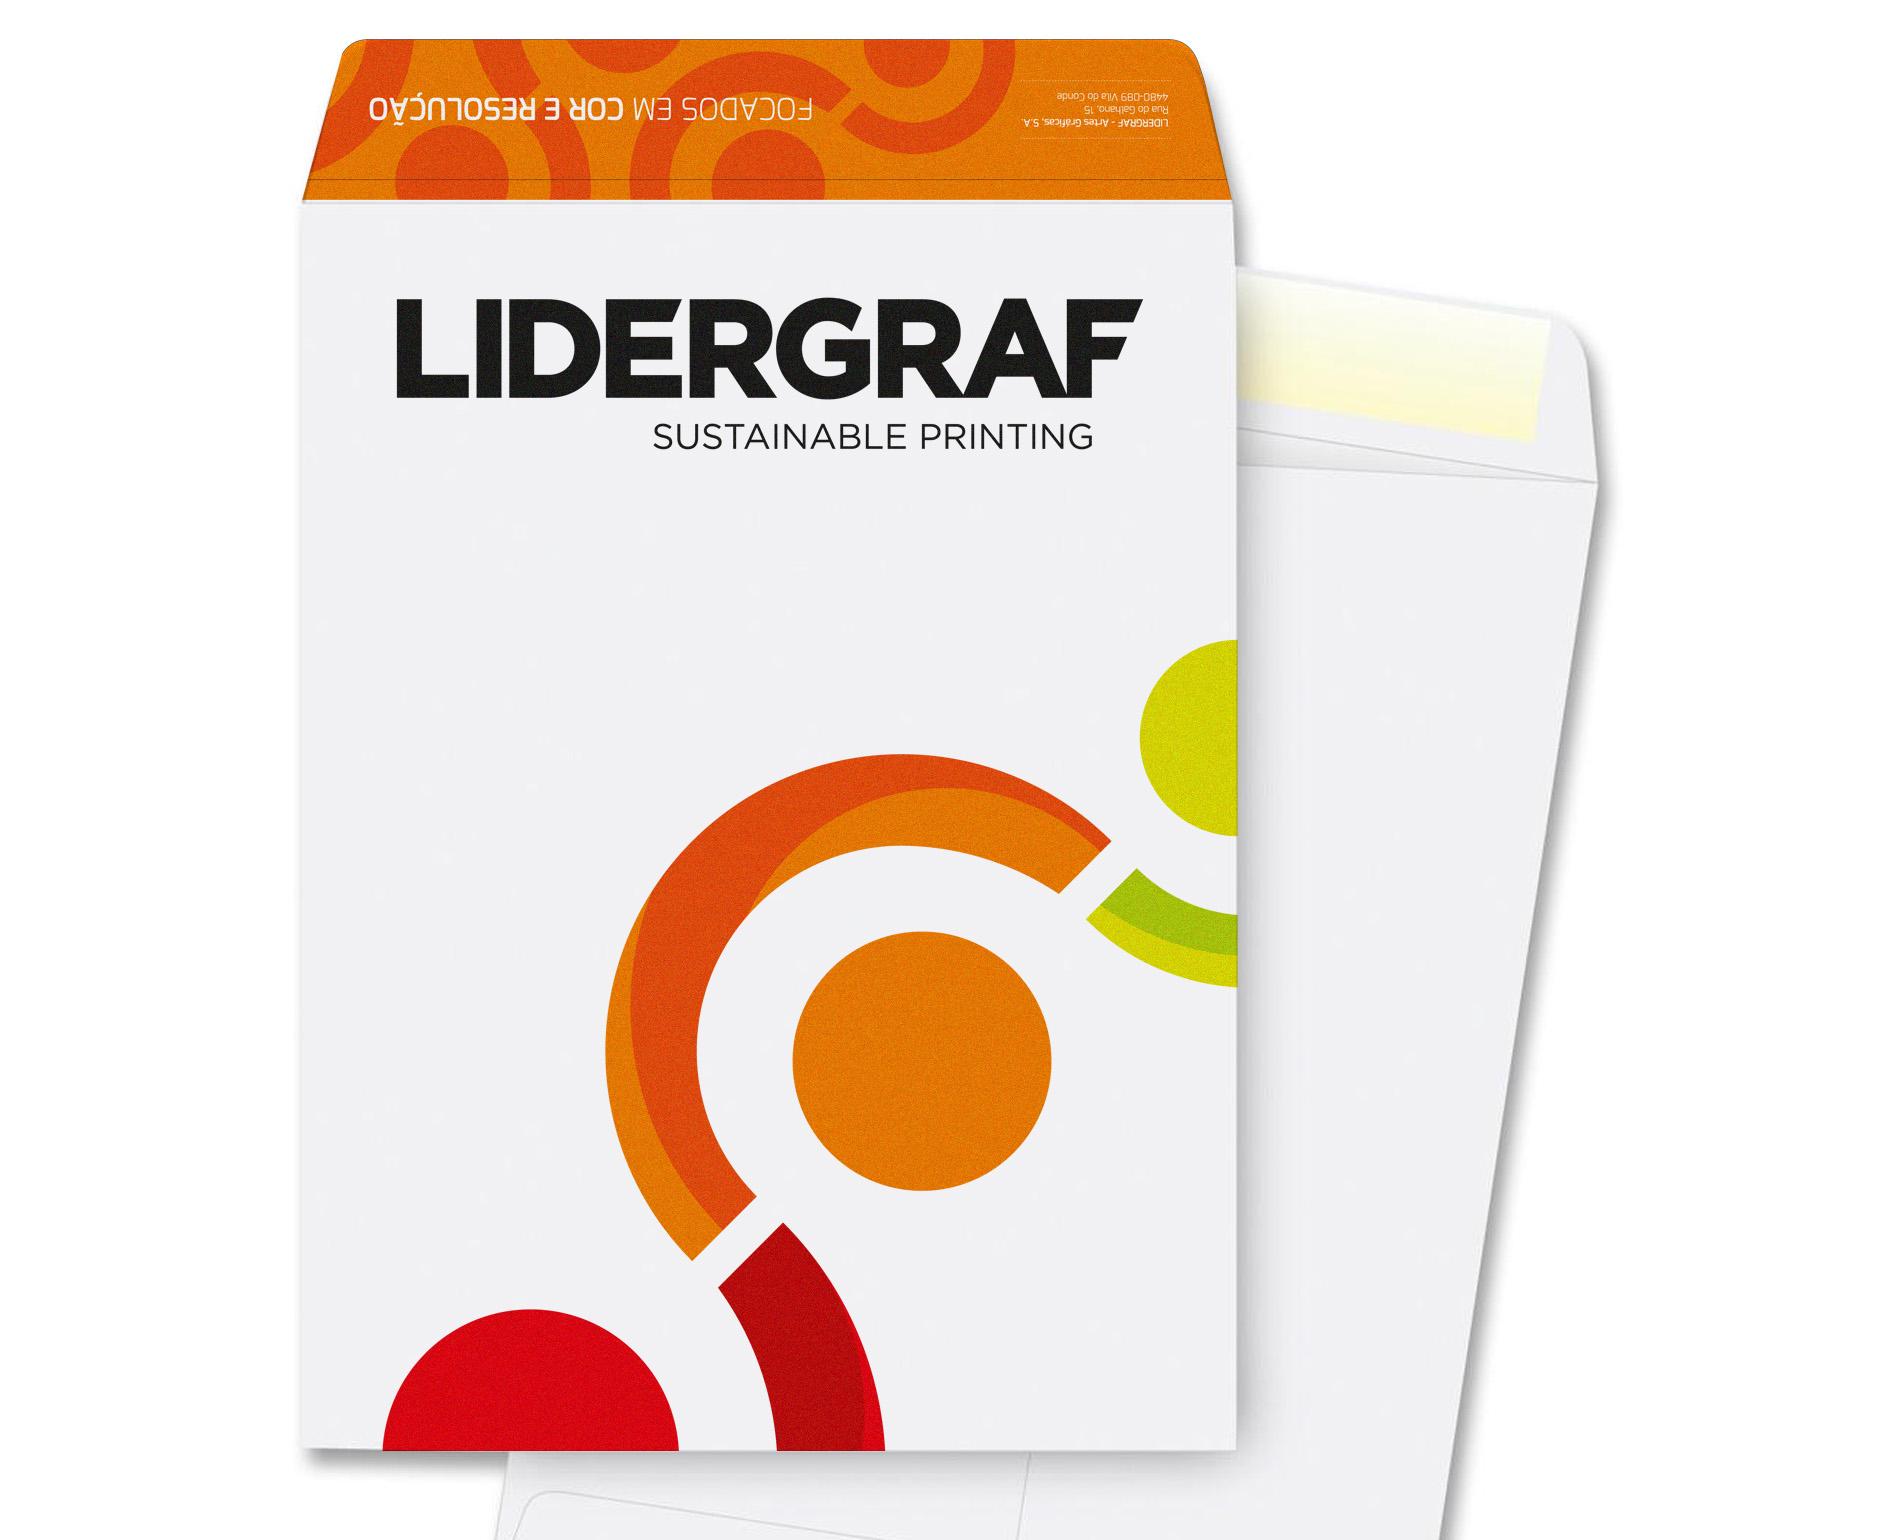 LIDERGRAF_Materiais